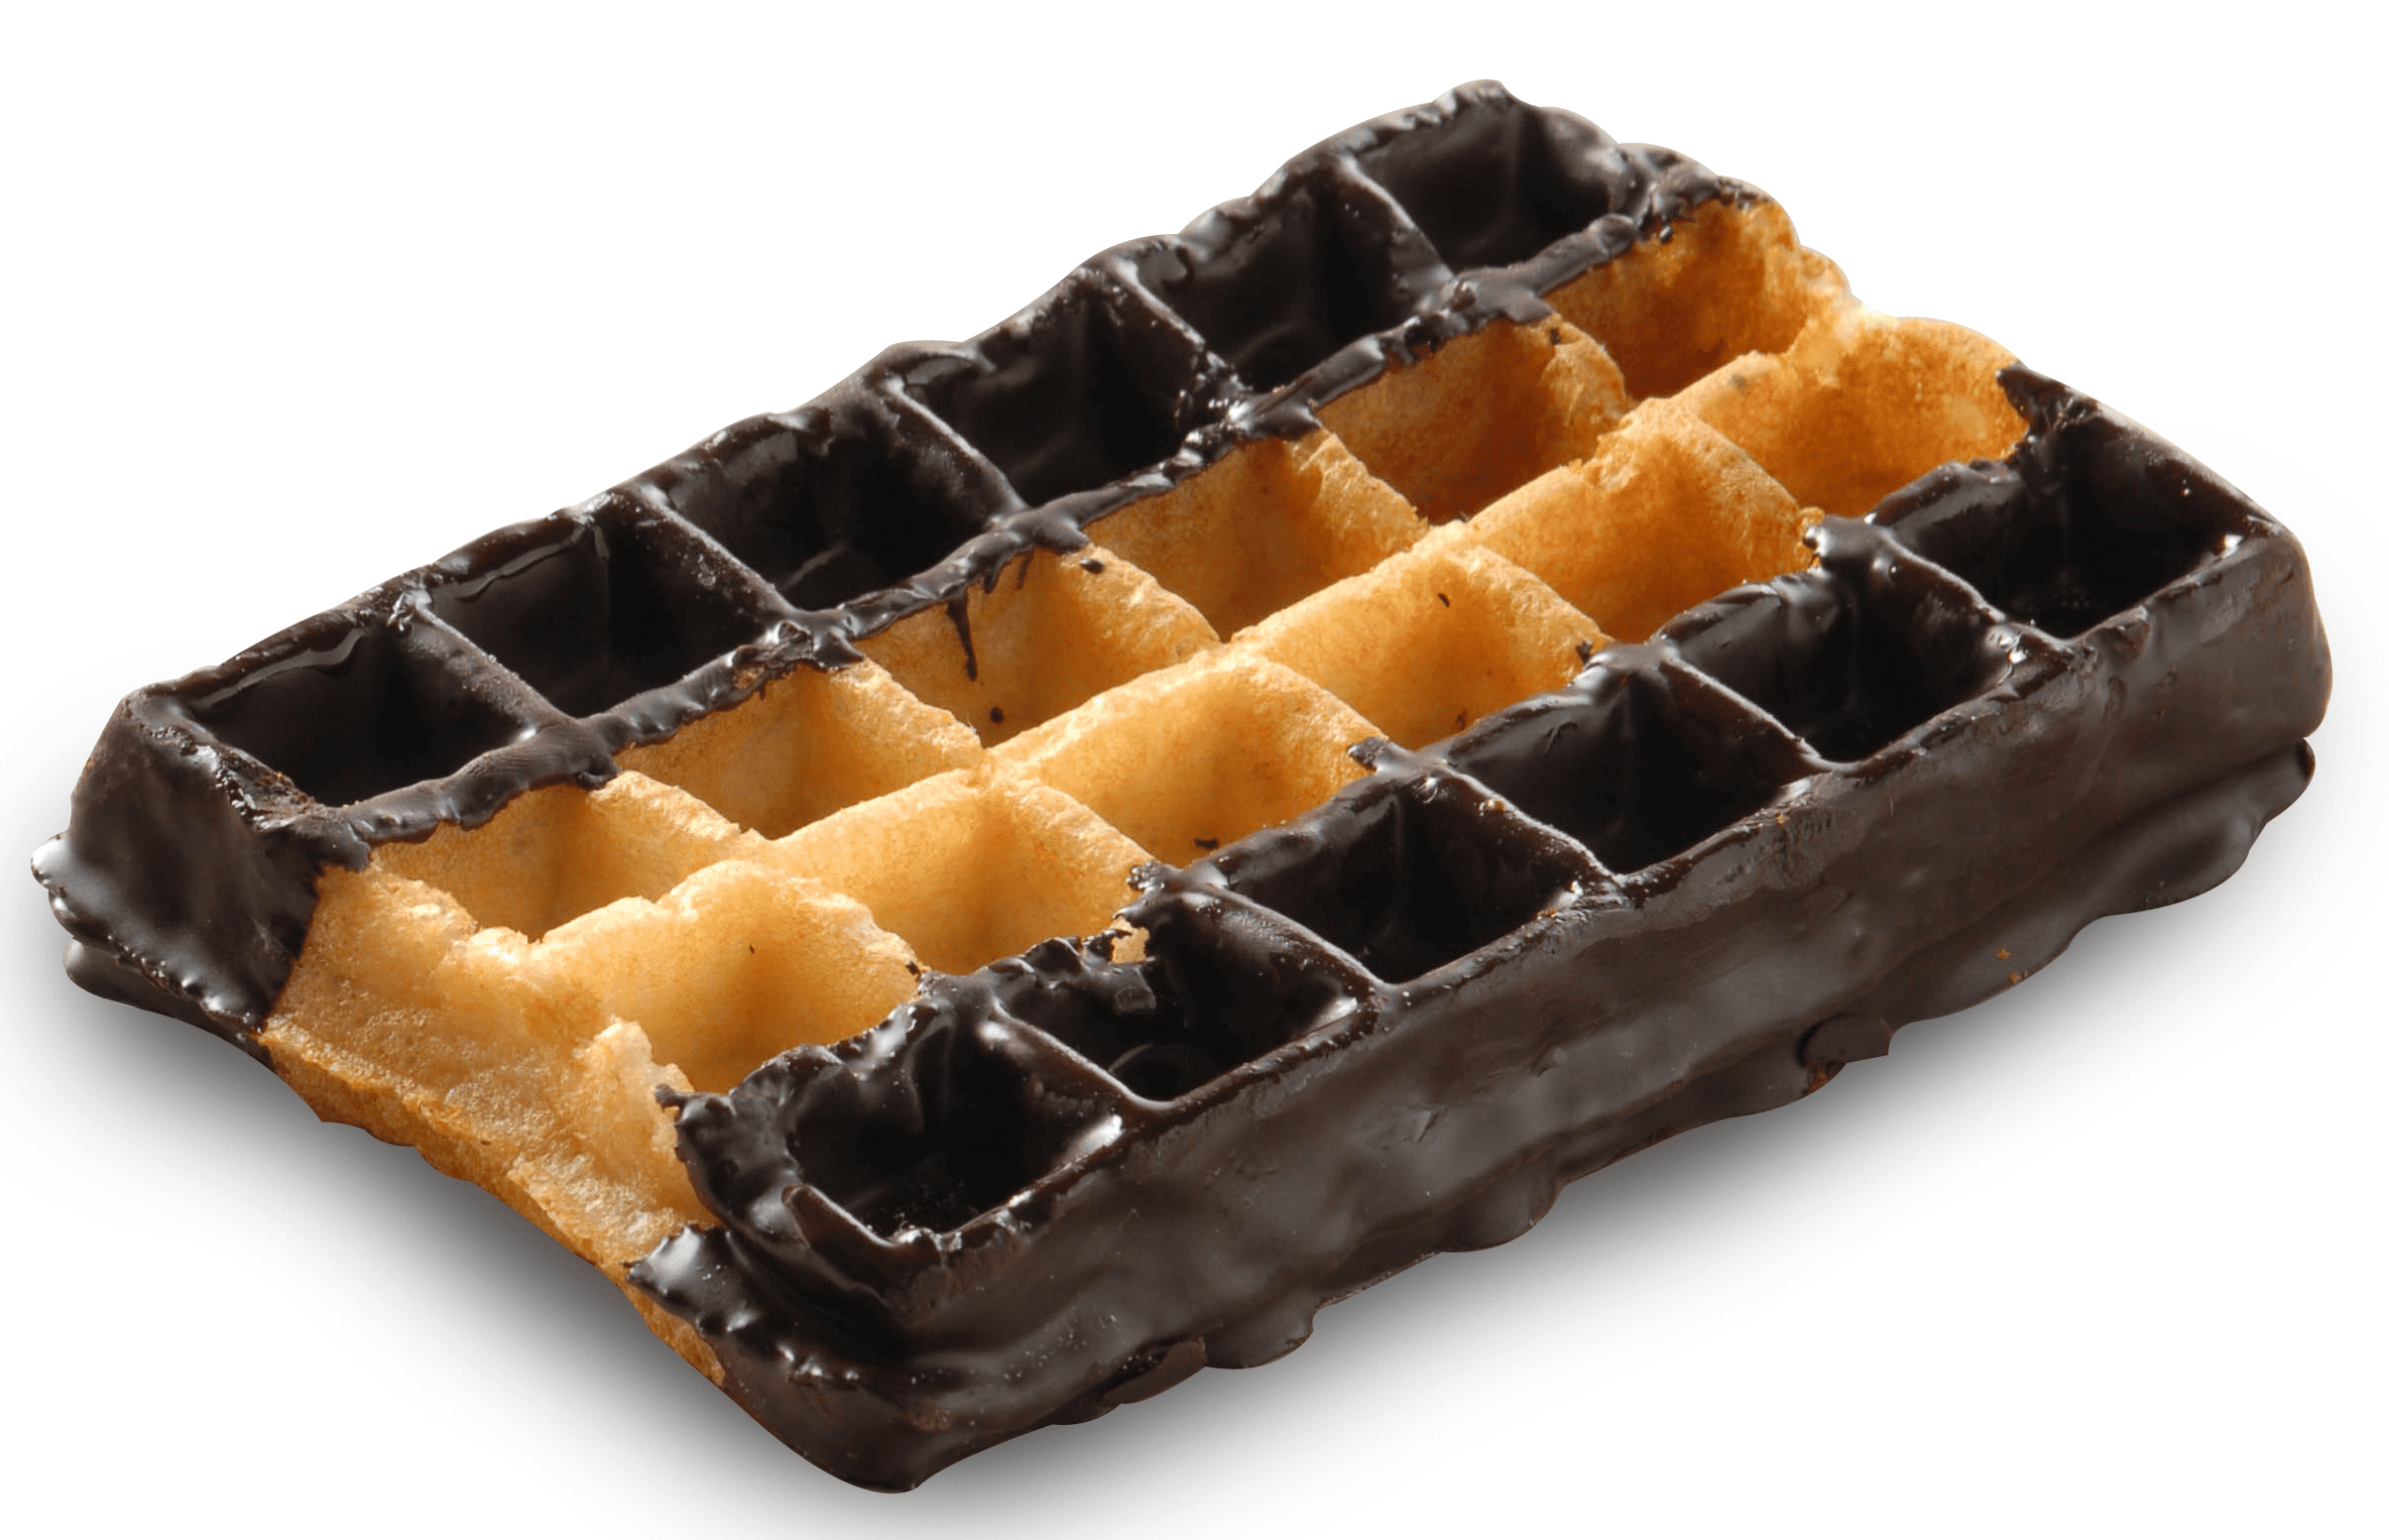 布魯塞爾巧克力鬆餅 Brussels Chocolate Waffle